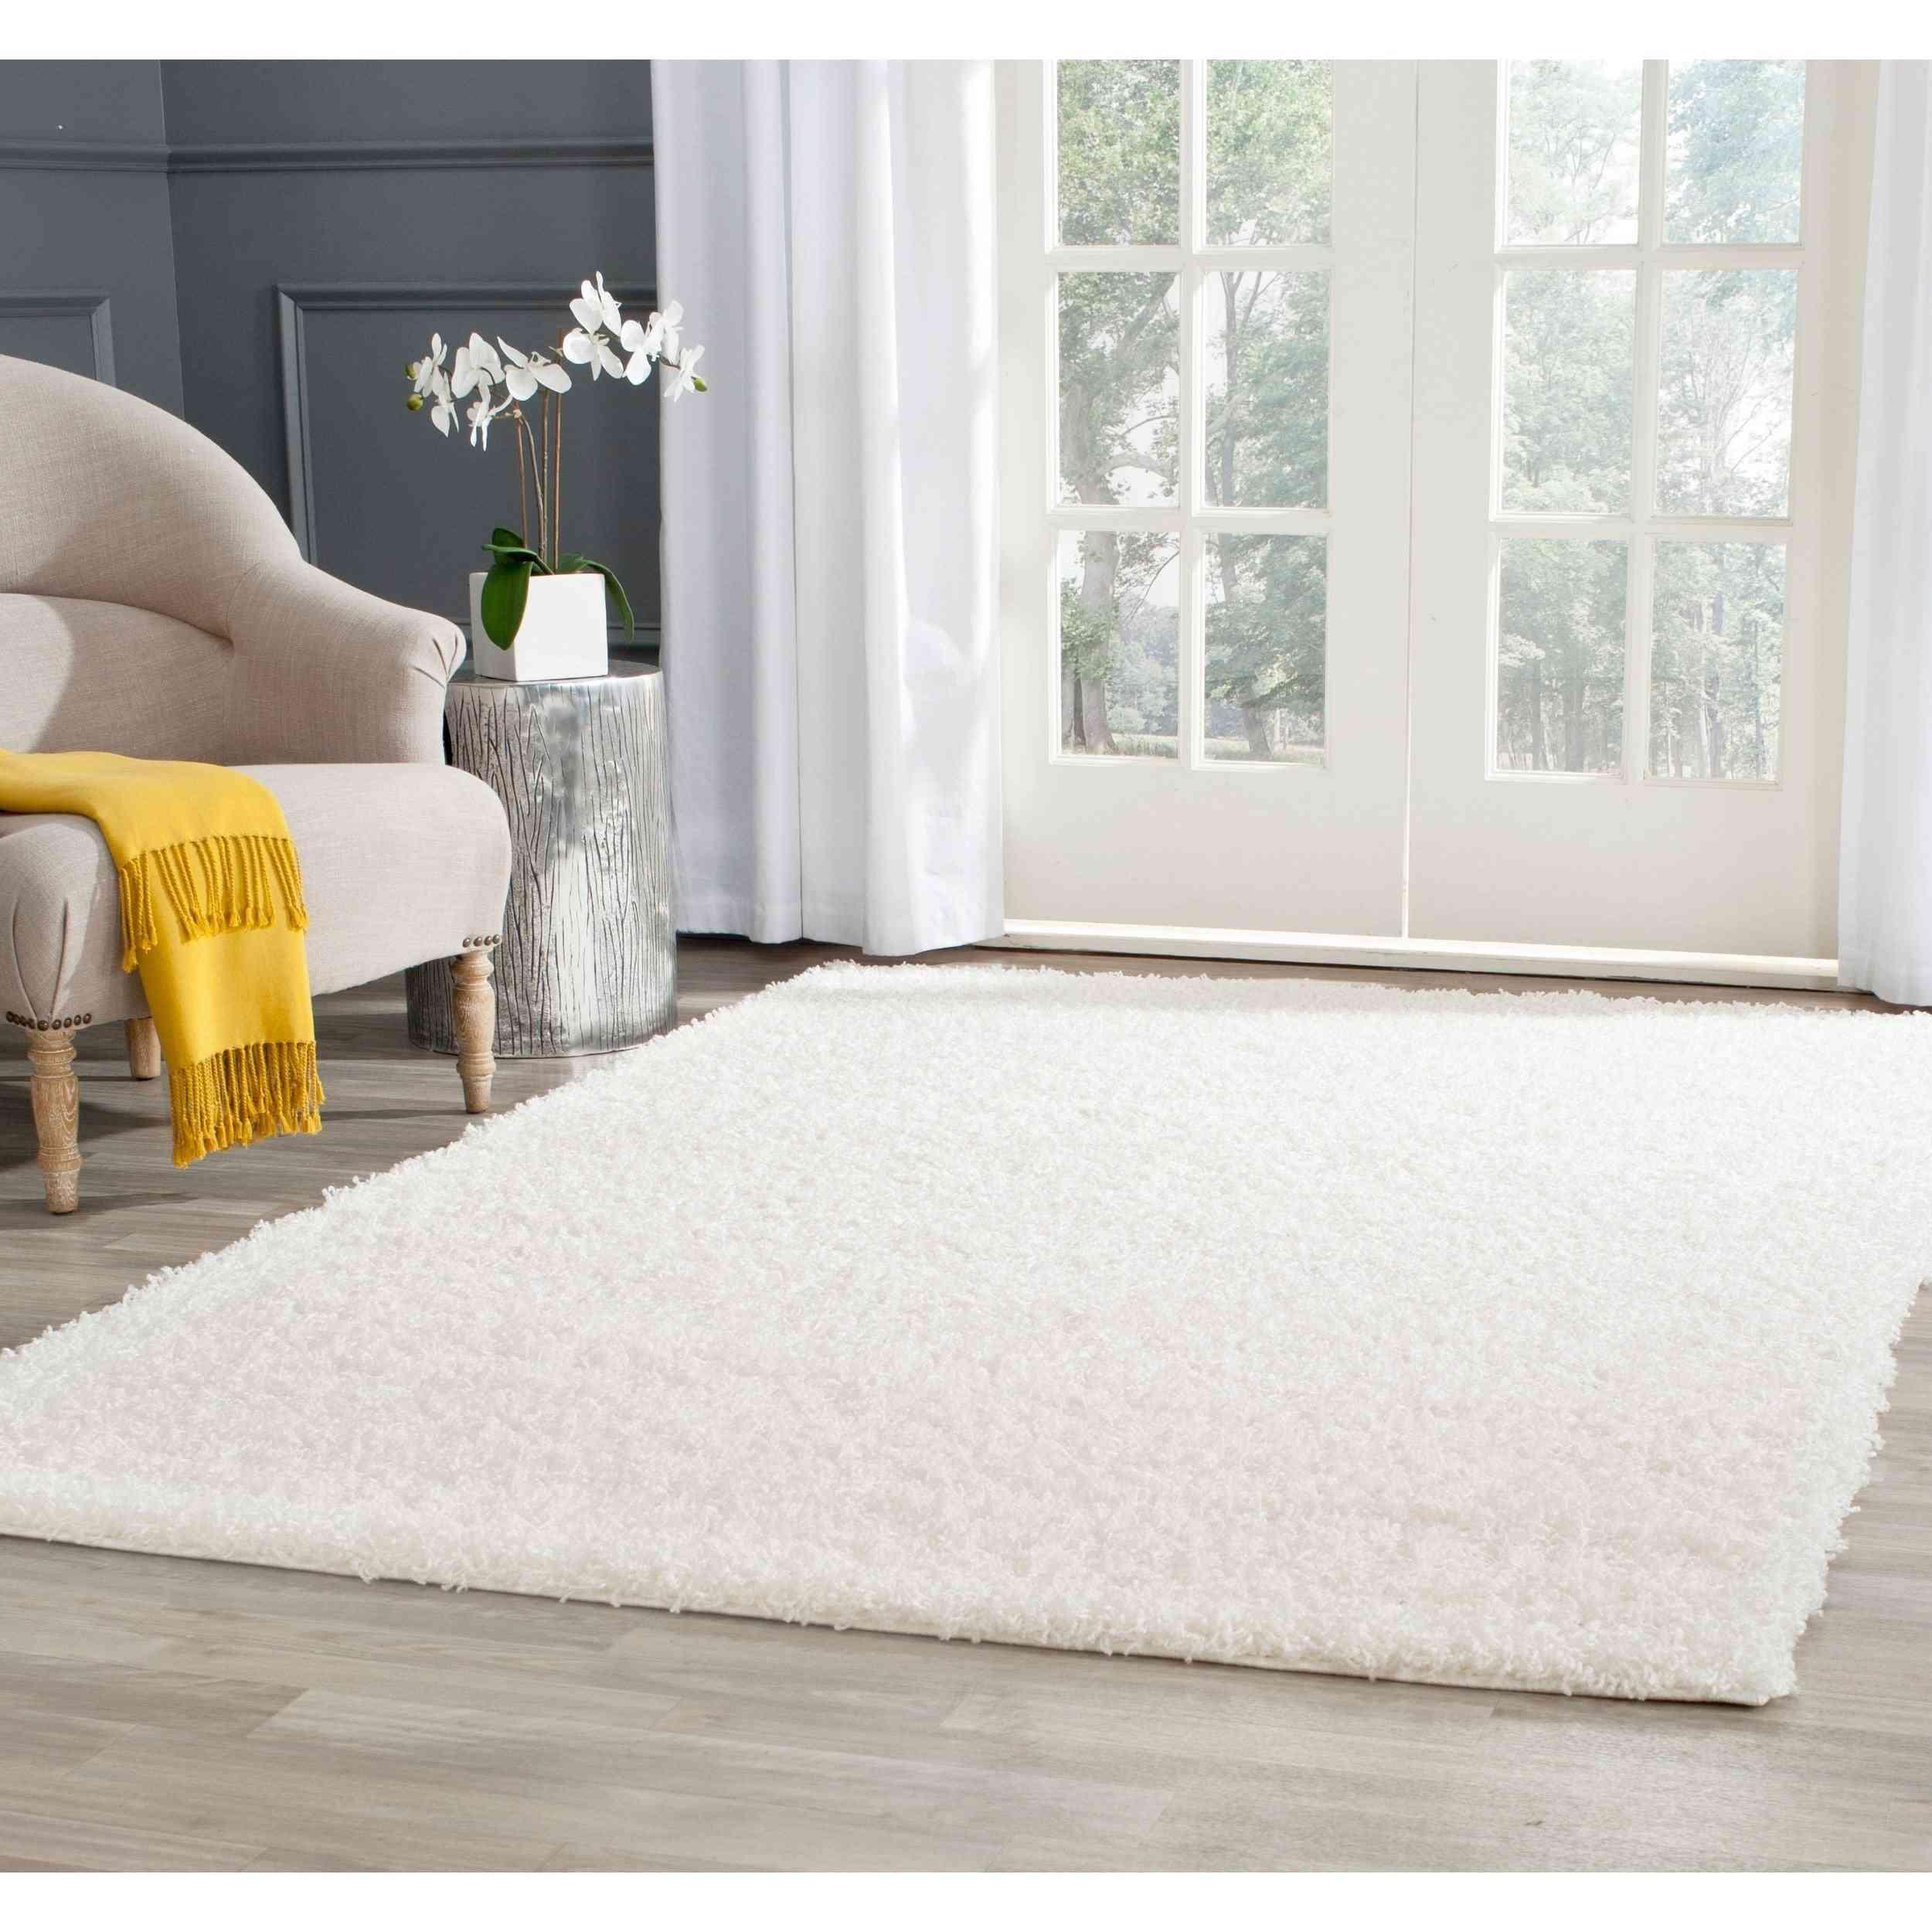 white shaggy area rug